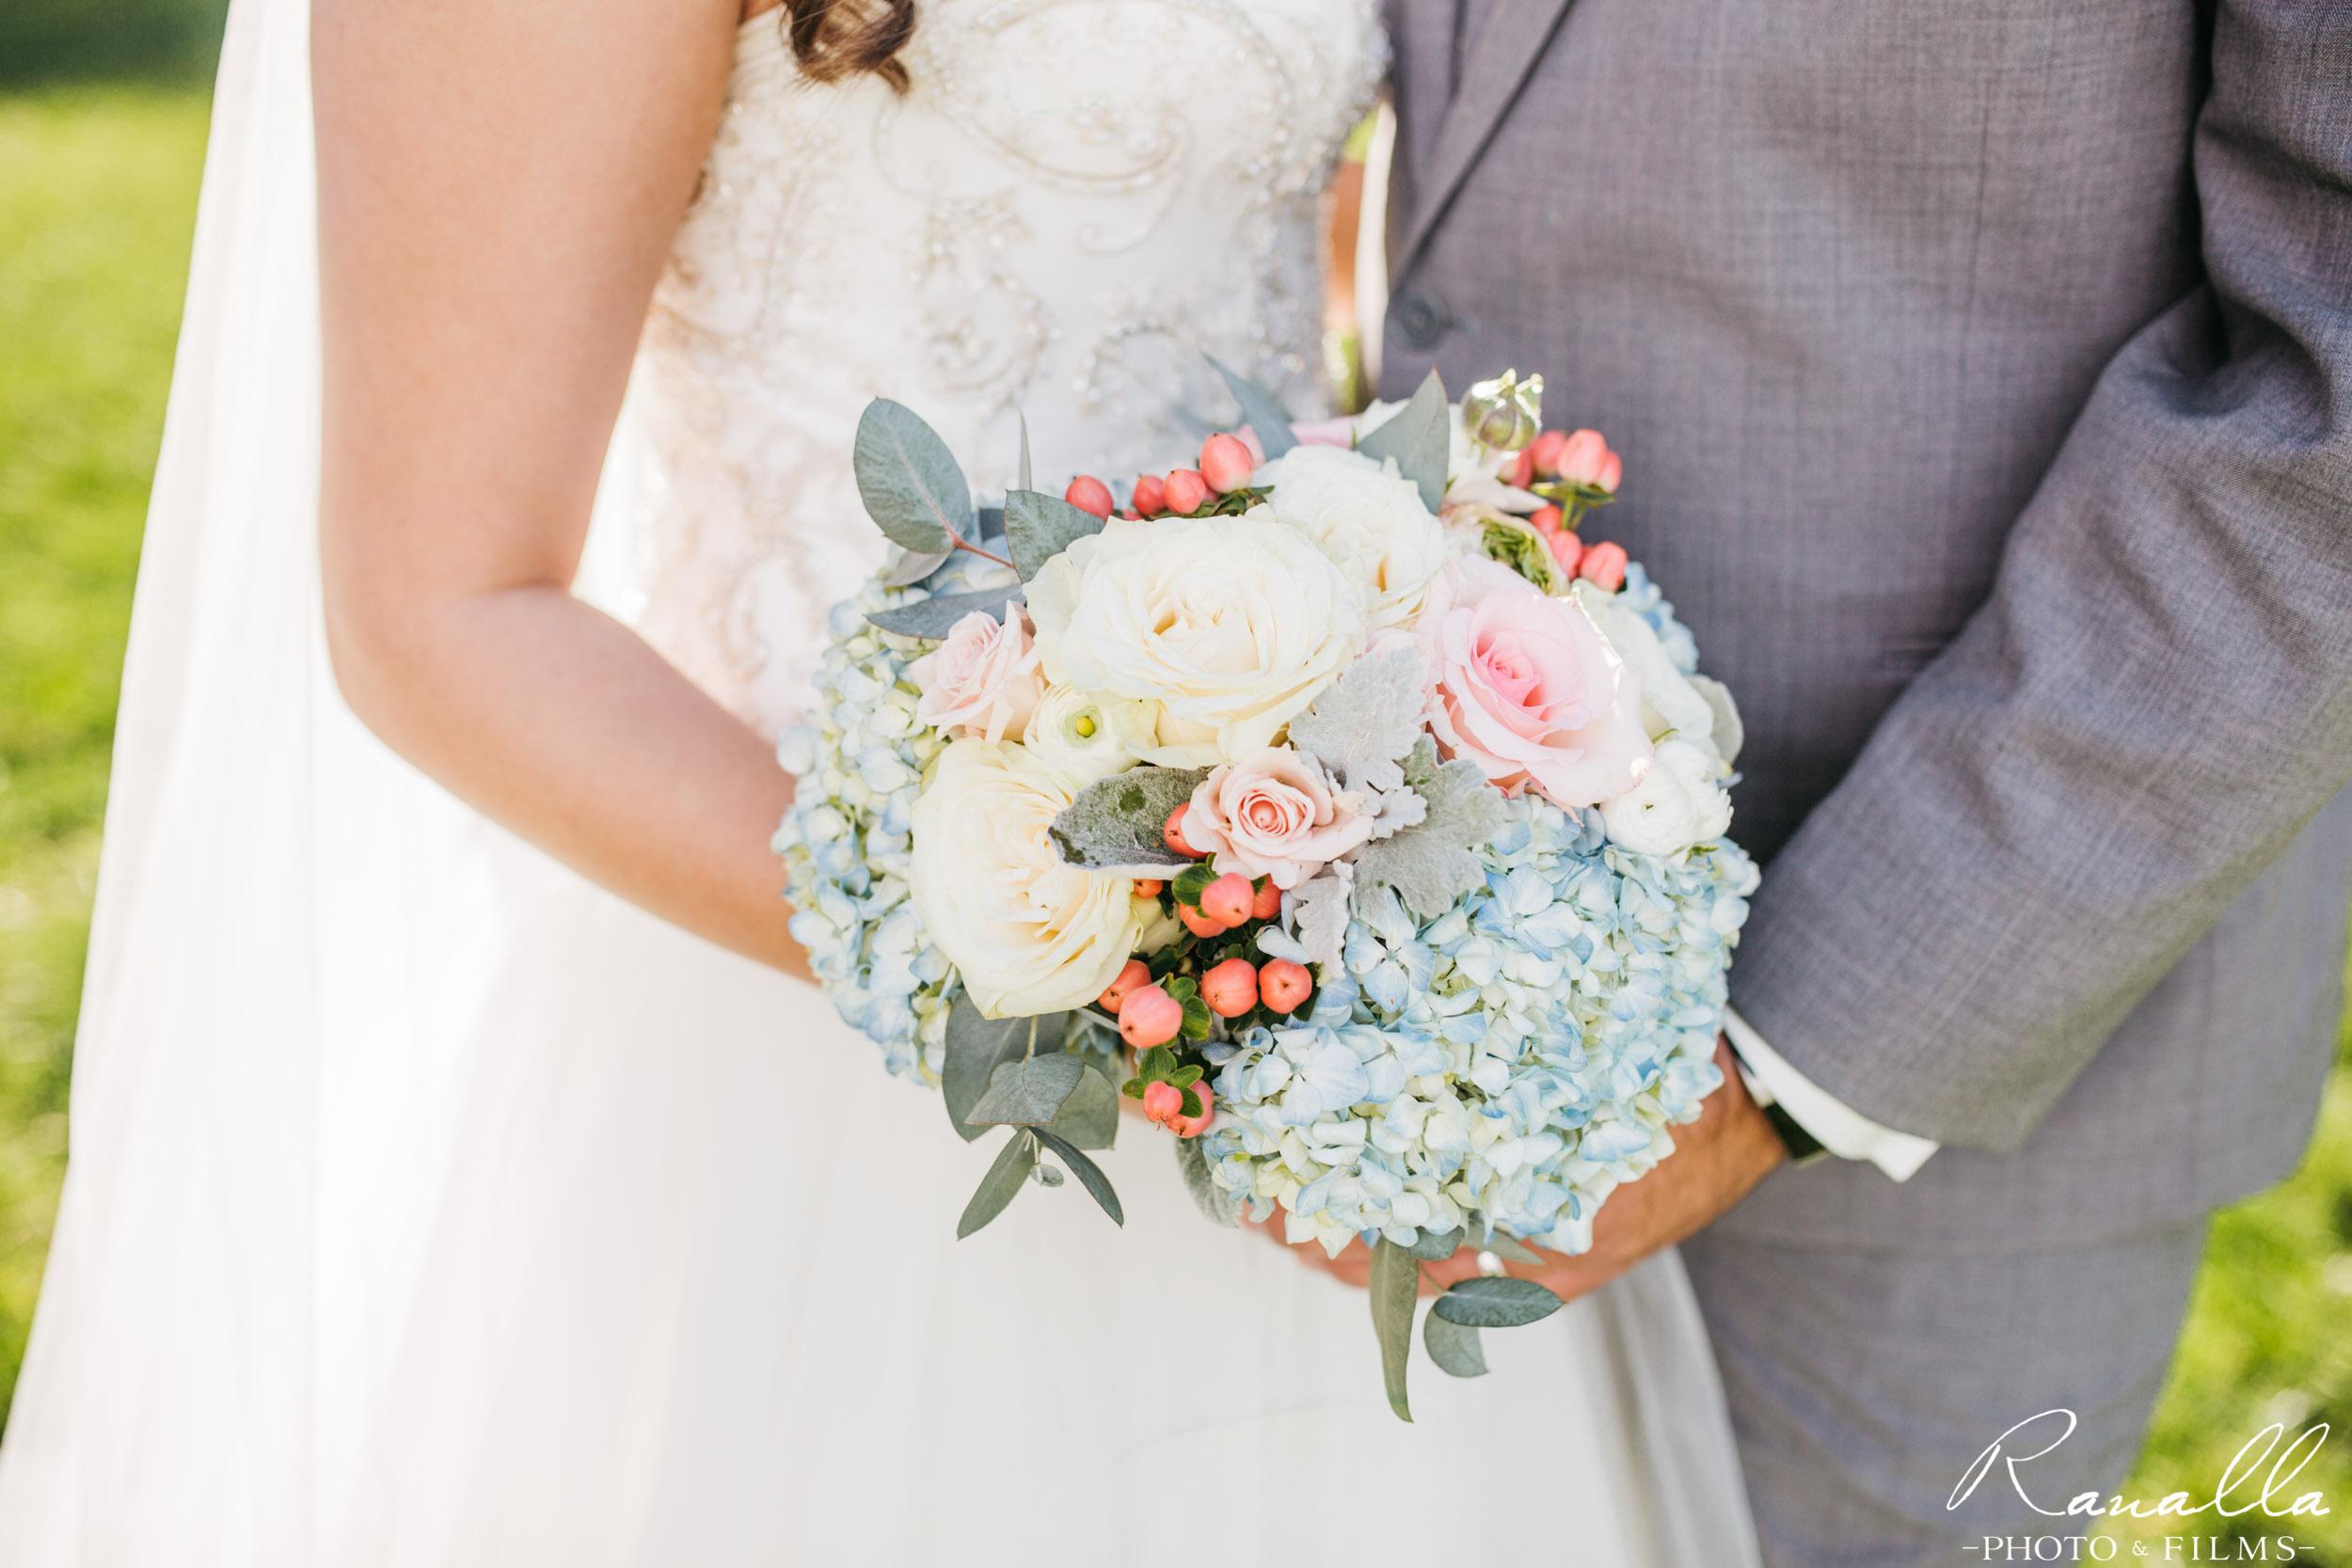 Chico Wedding Photography- Roses & Hydrangea Bouquet- Patrick Ranch Wedding Photos- Ranalla Photo & Films